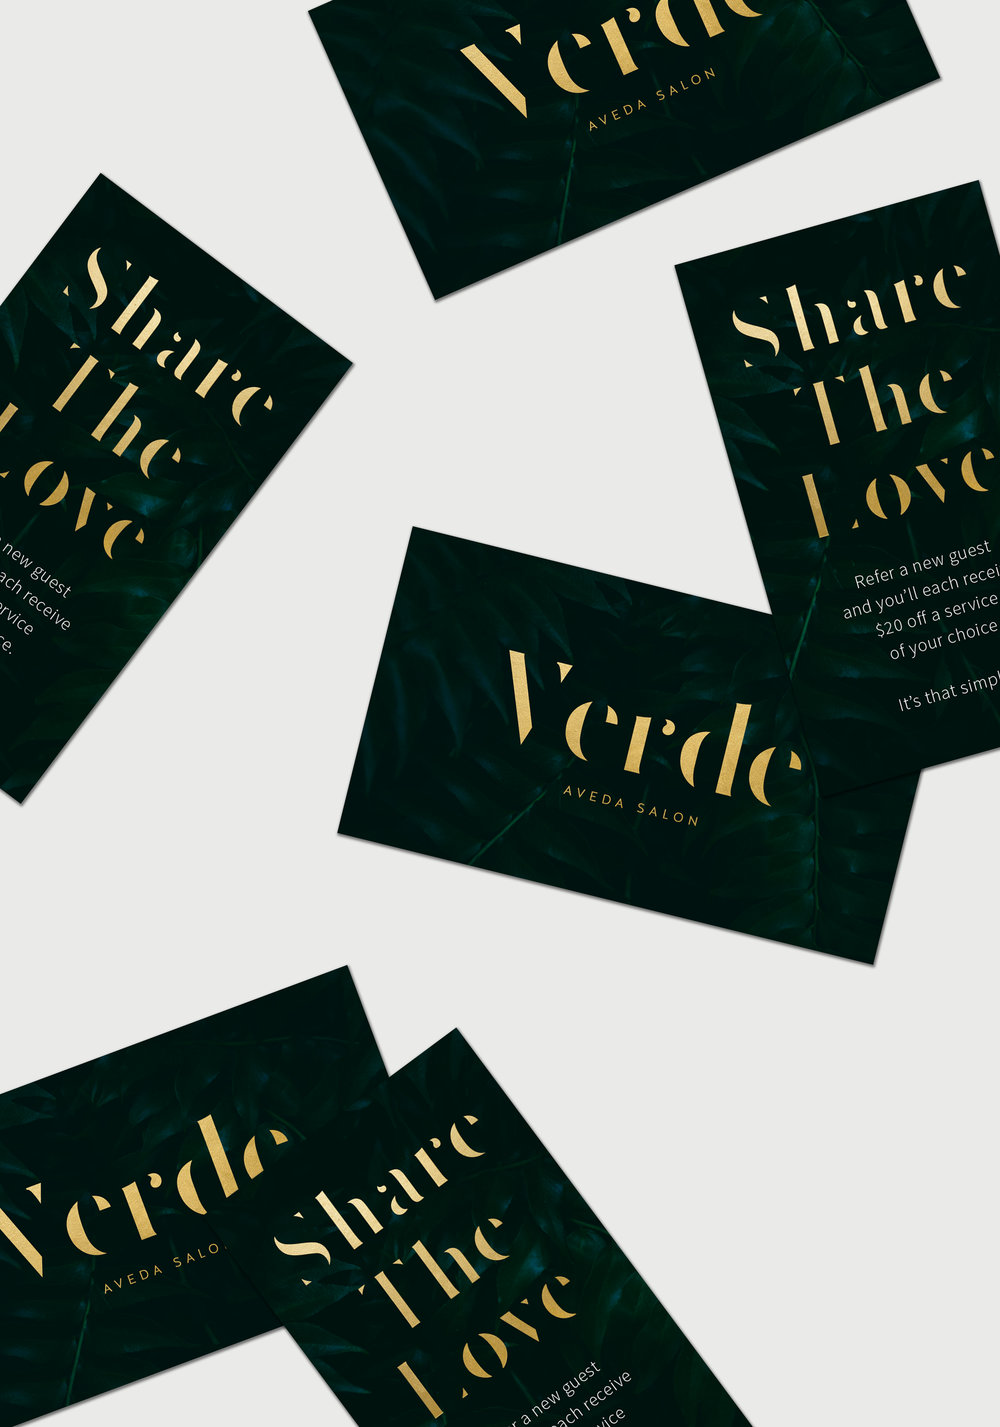 verde-aveda-salon-winnipeg-bridgwater-branding-design-business-cards-clover-and-crow